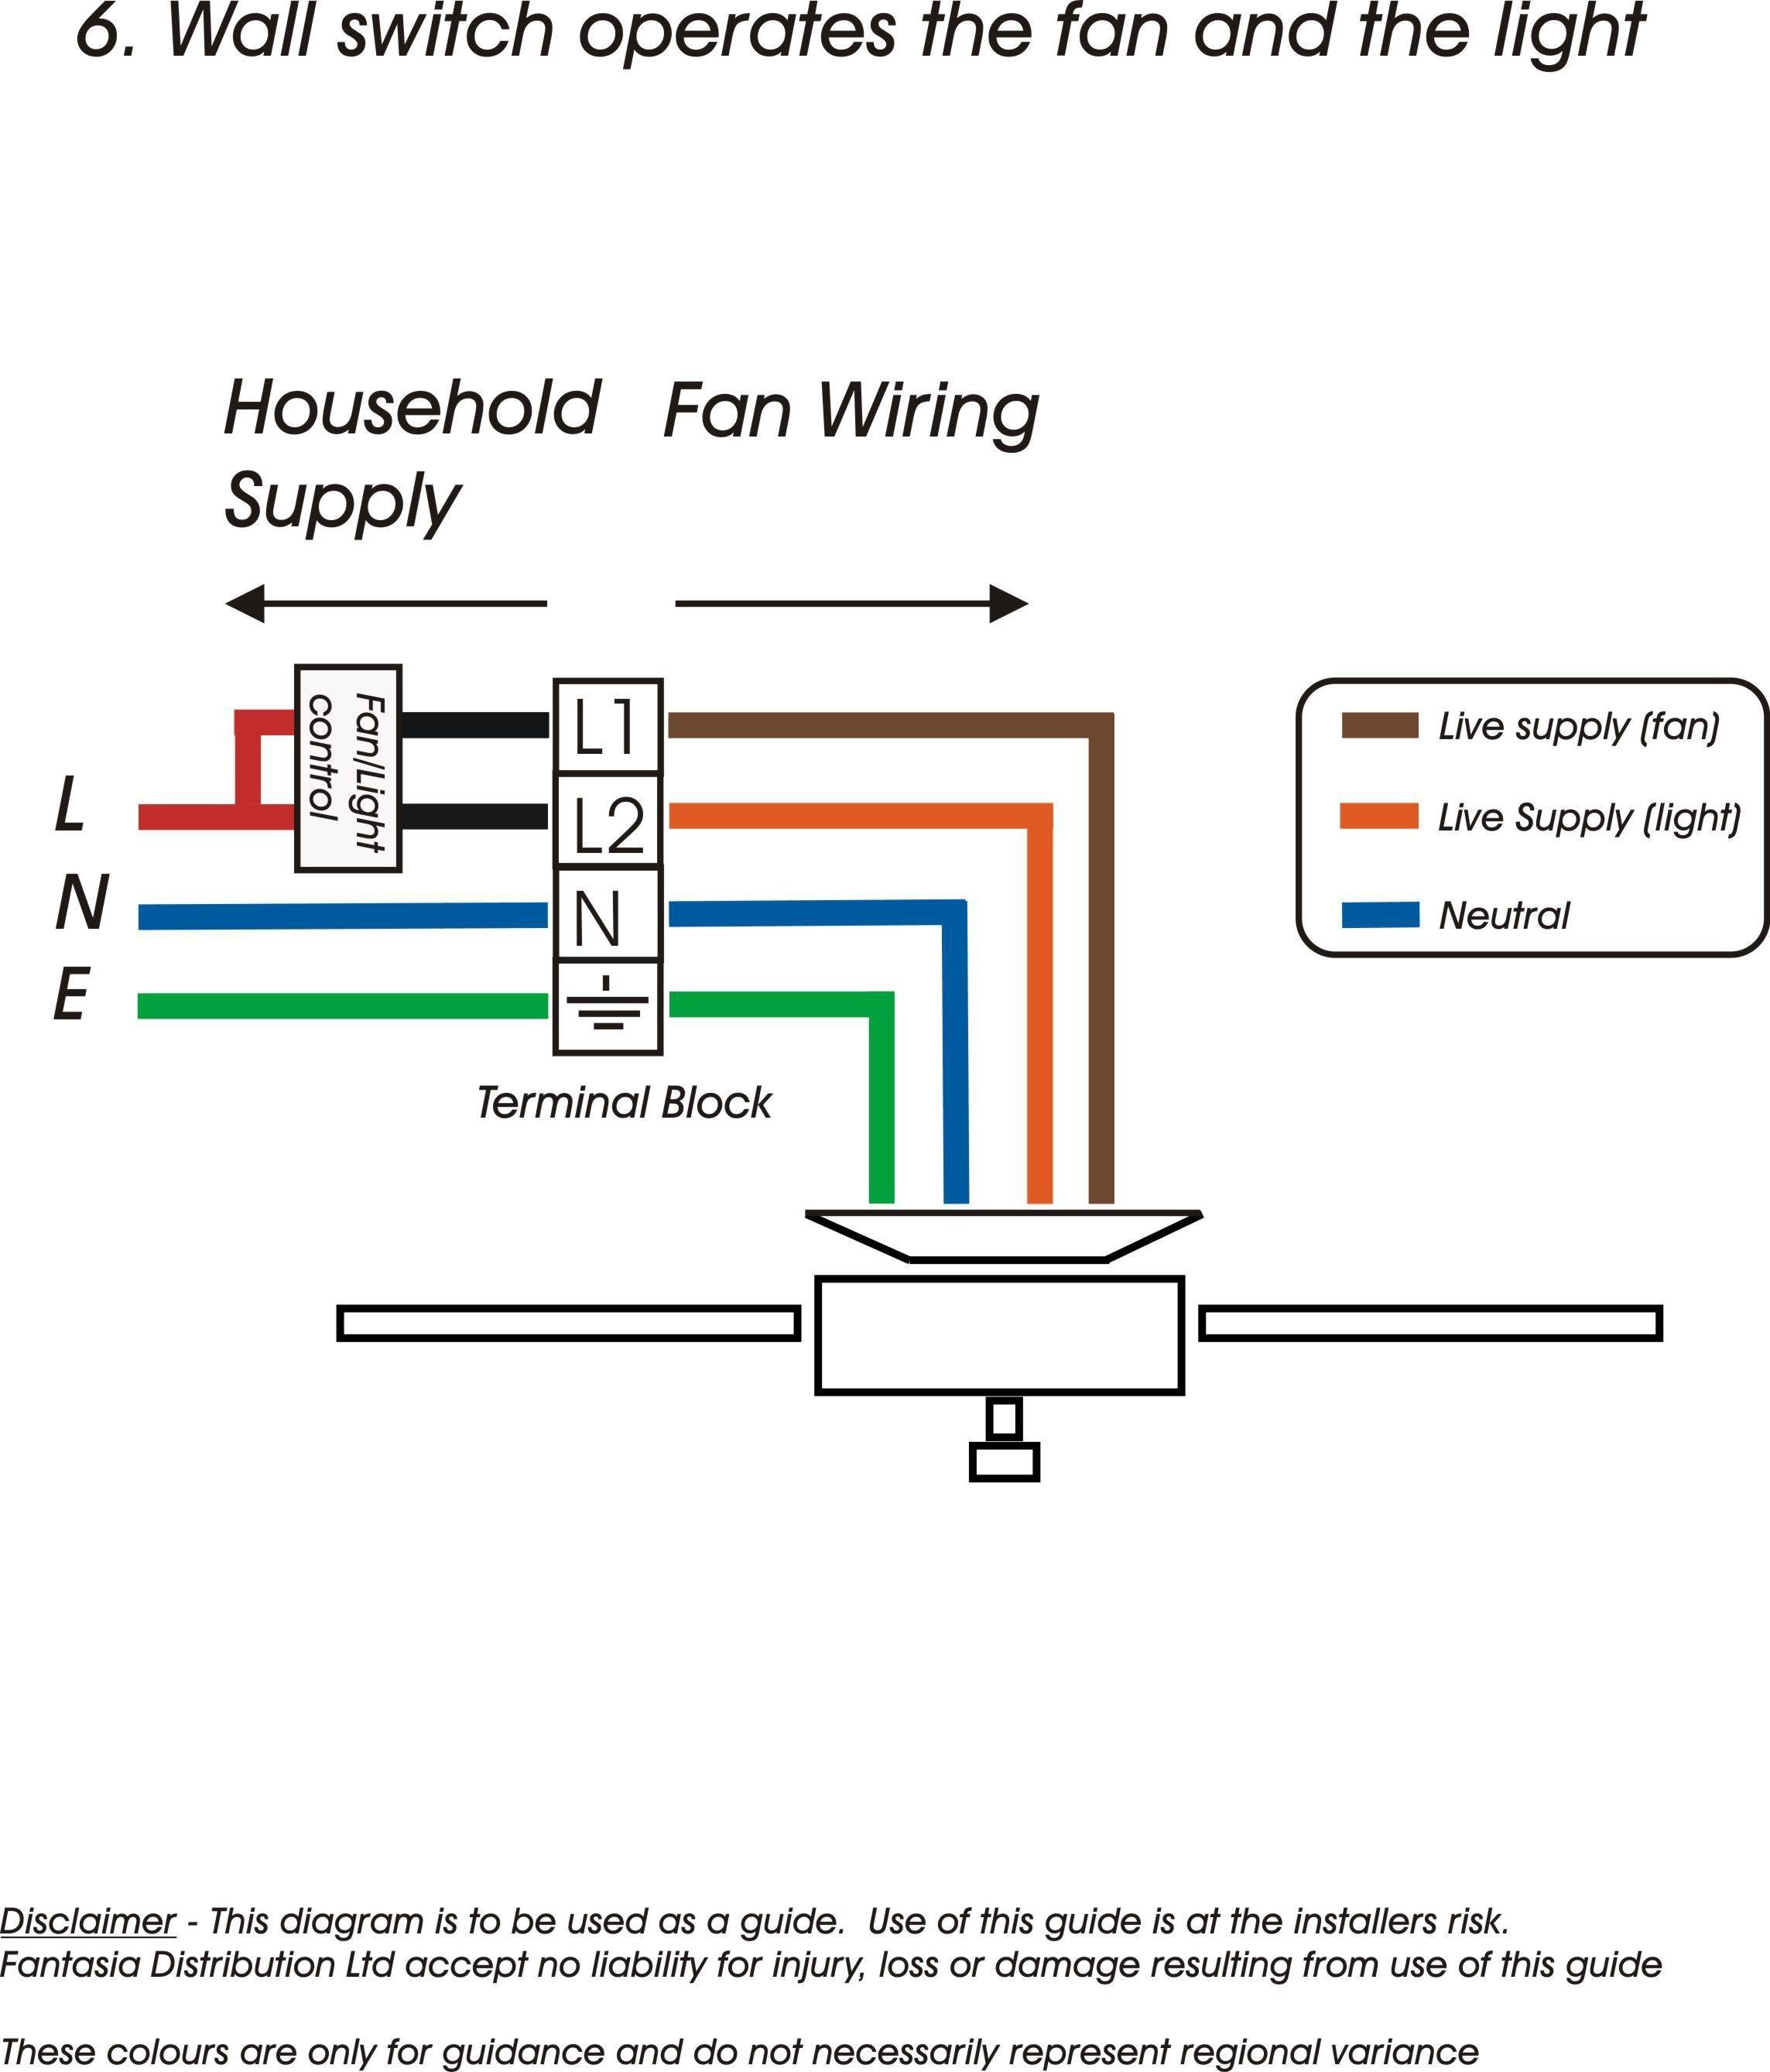 T12 Ballast Wiring Diagram Best Of In 2020 Ceiling Fan Wiring Fan Light Ceiling Fan With Light